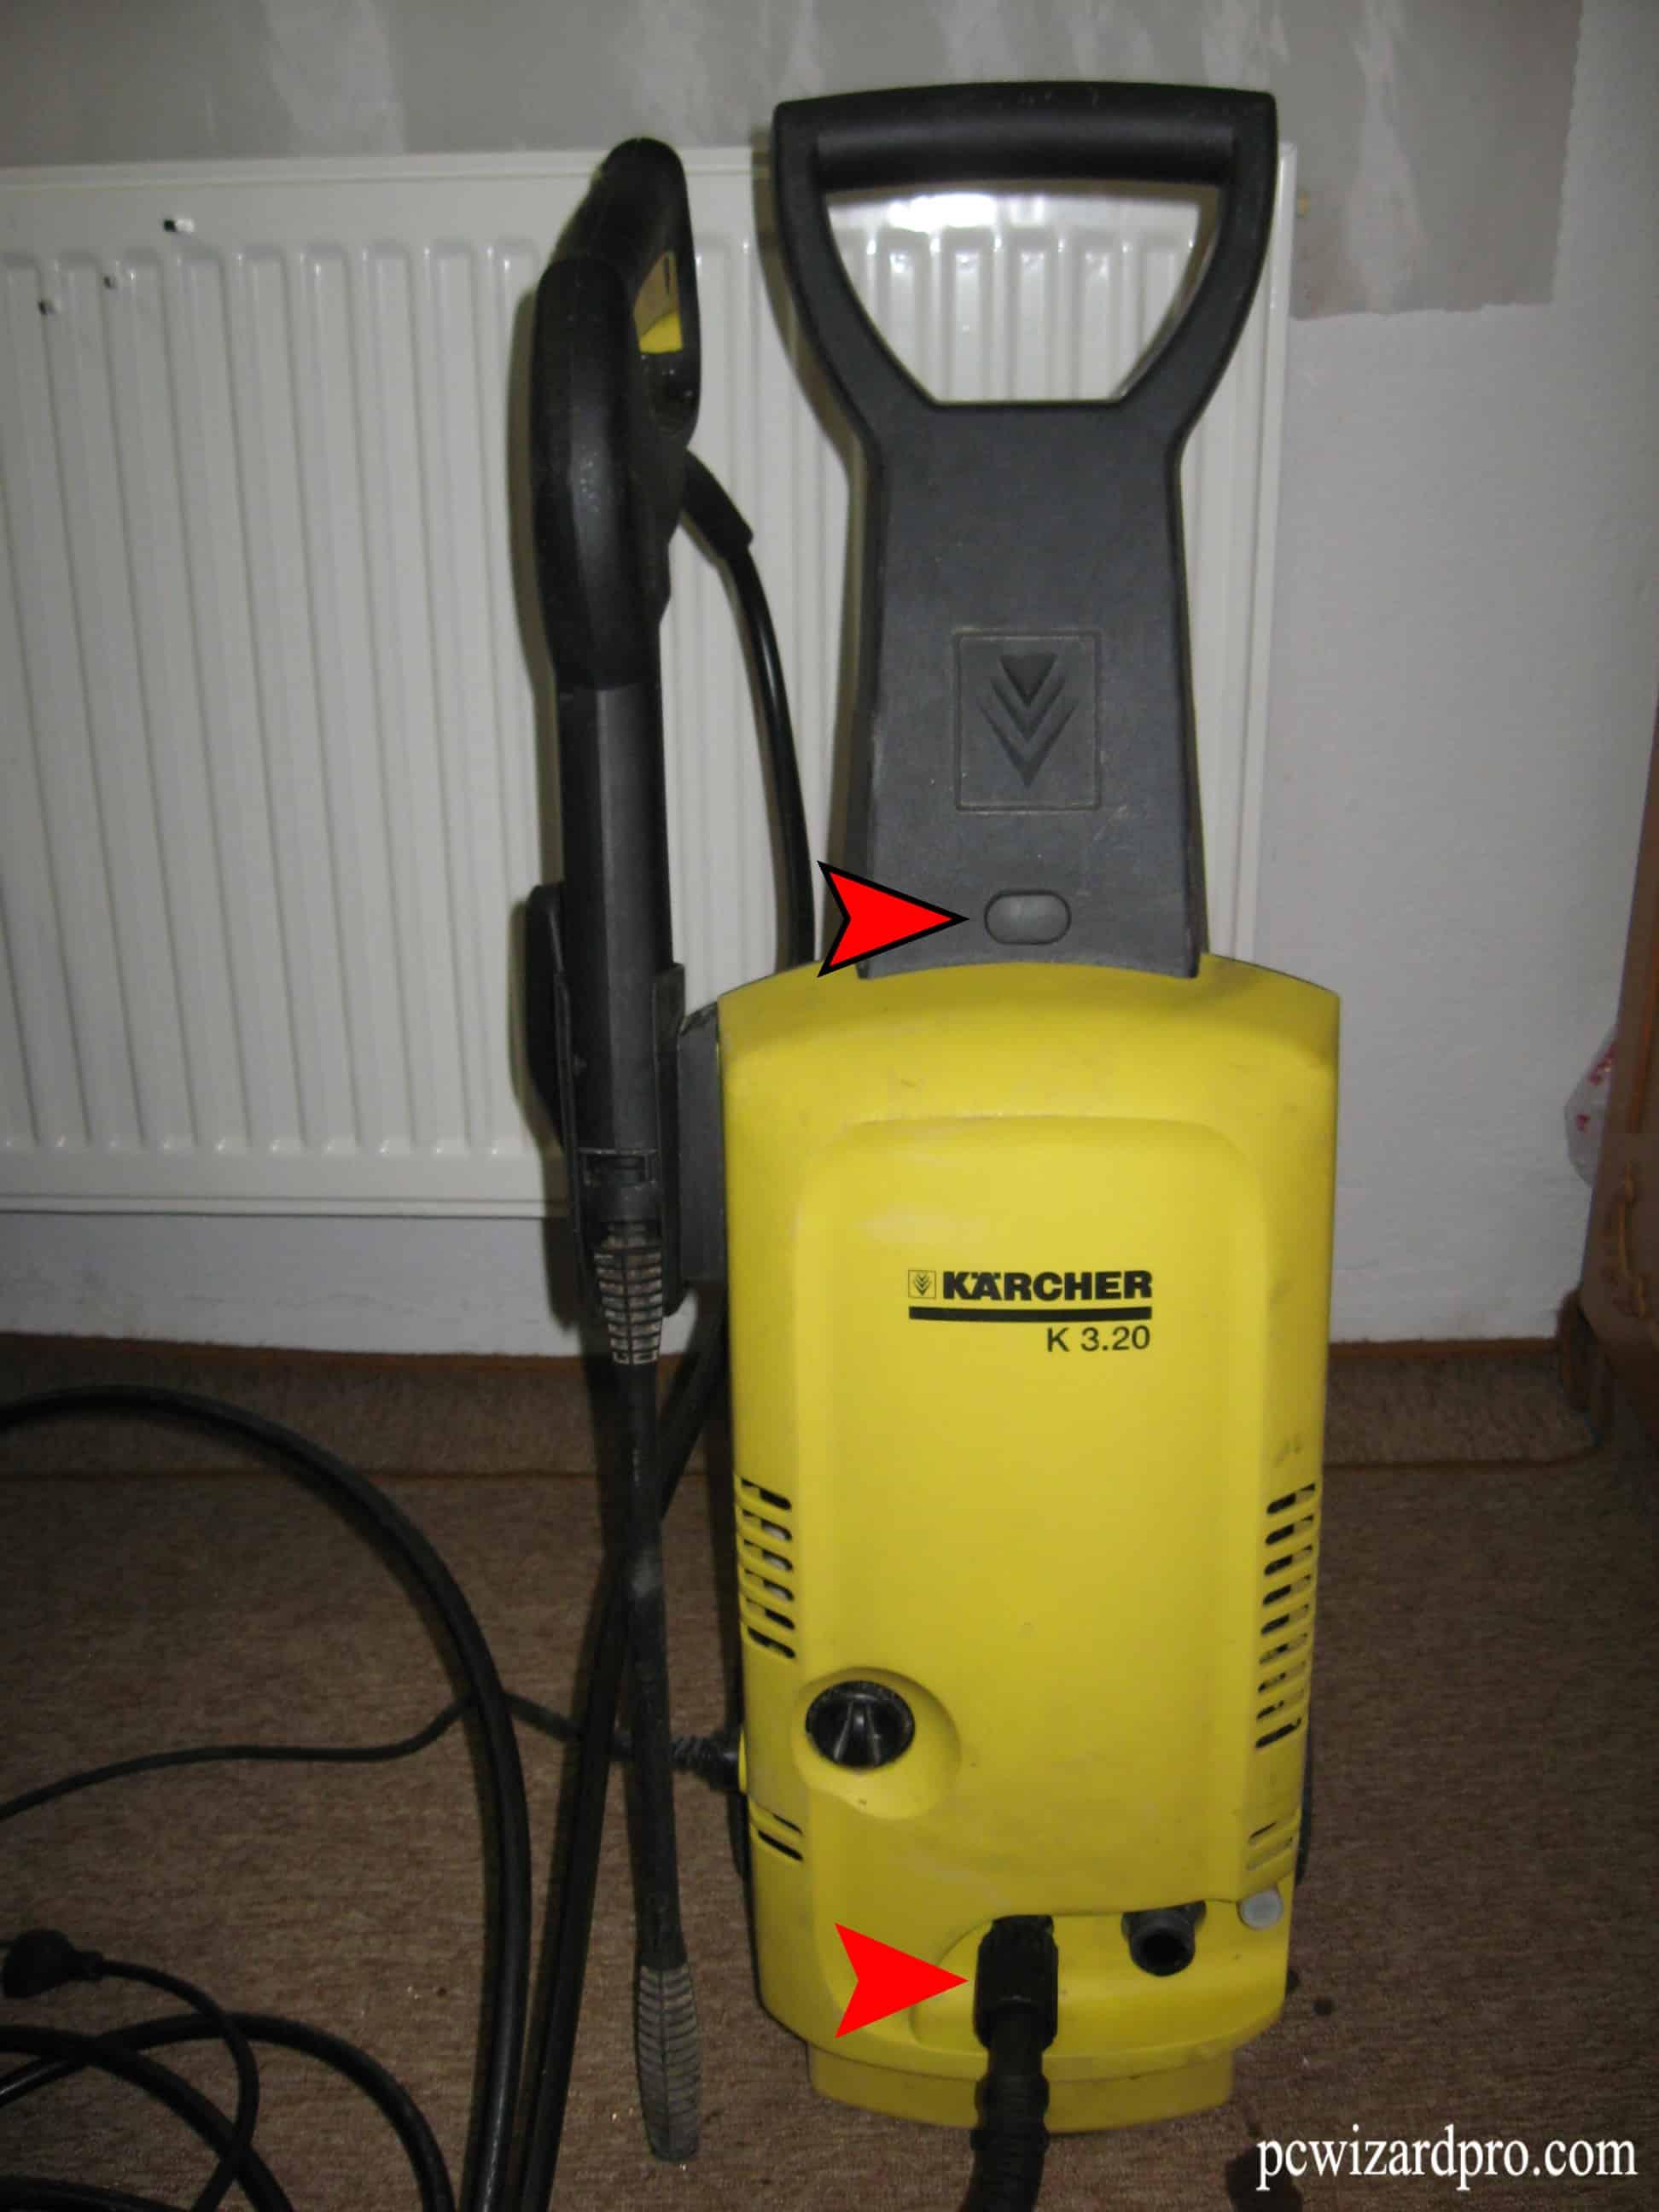 Karcher Perfect Karcher Hdss Kw Psi Hot Water Steam